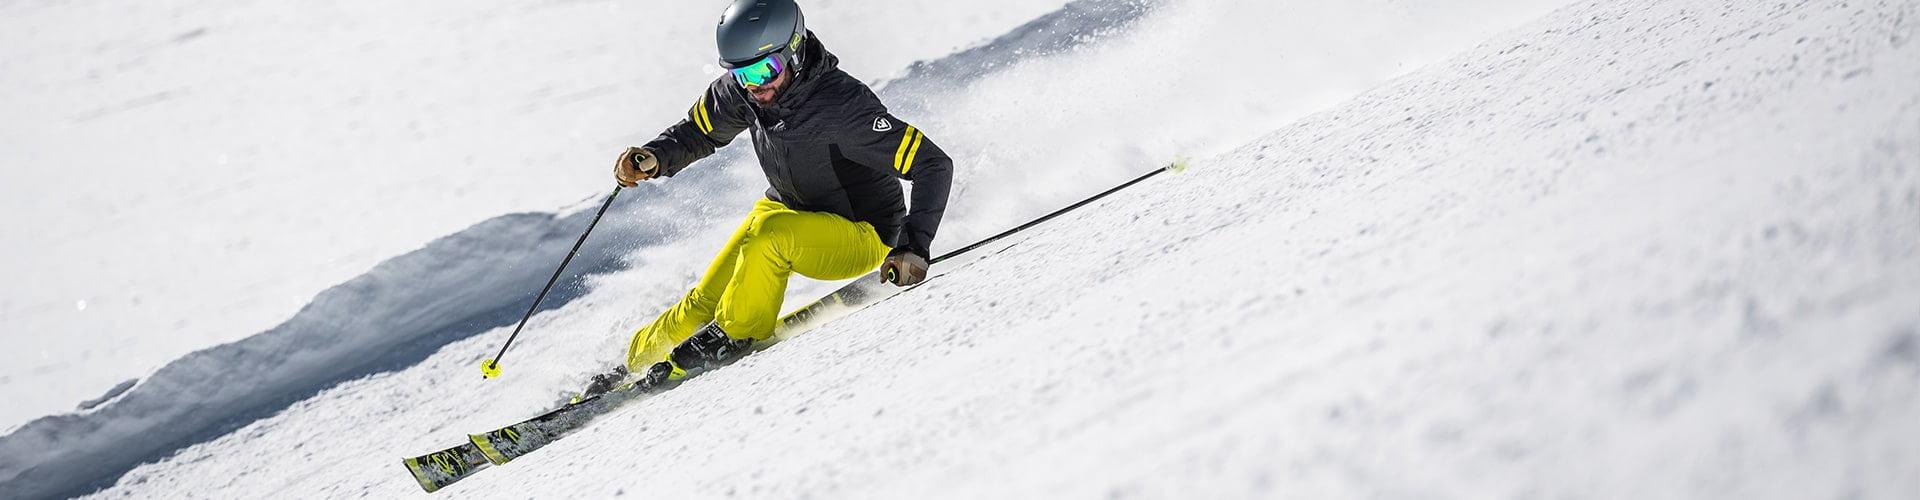 https://www.marques-de-france.fr/wp-content/uploads/2019/03/Rossignol_ski.jpg